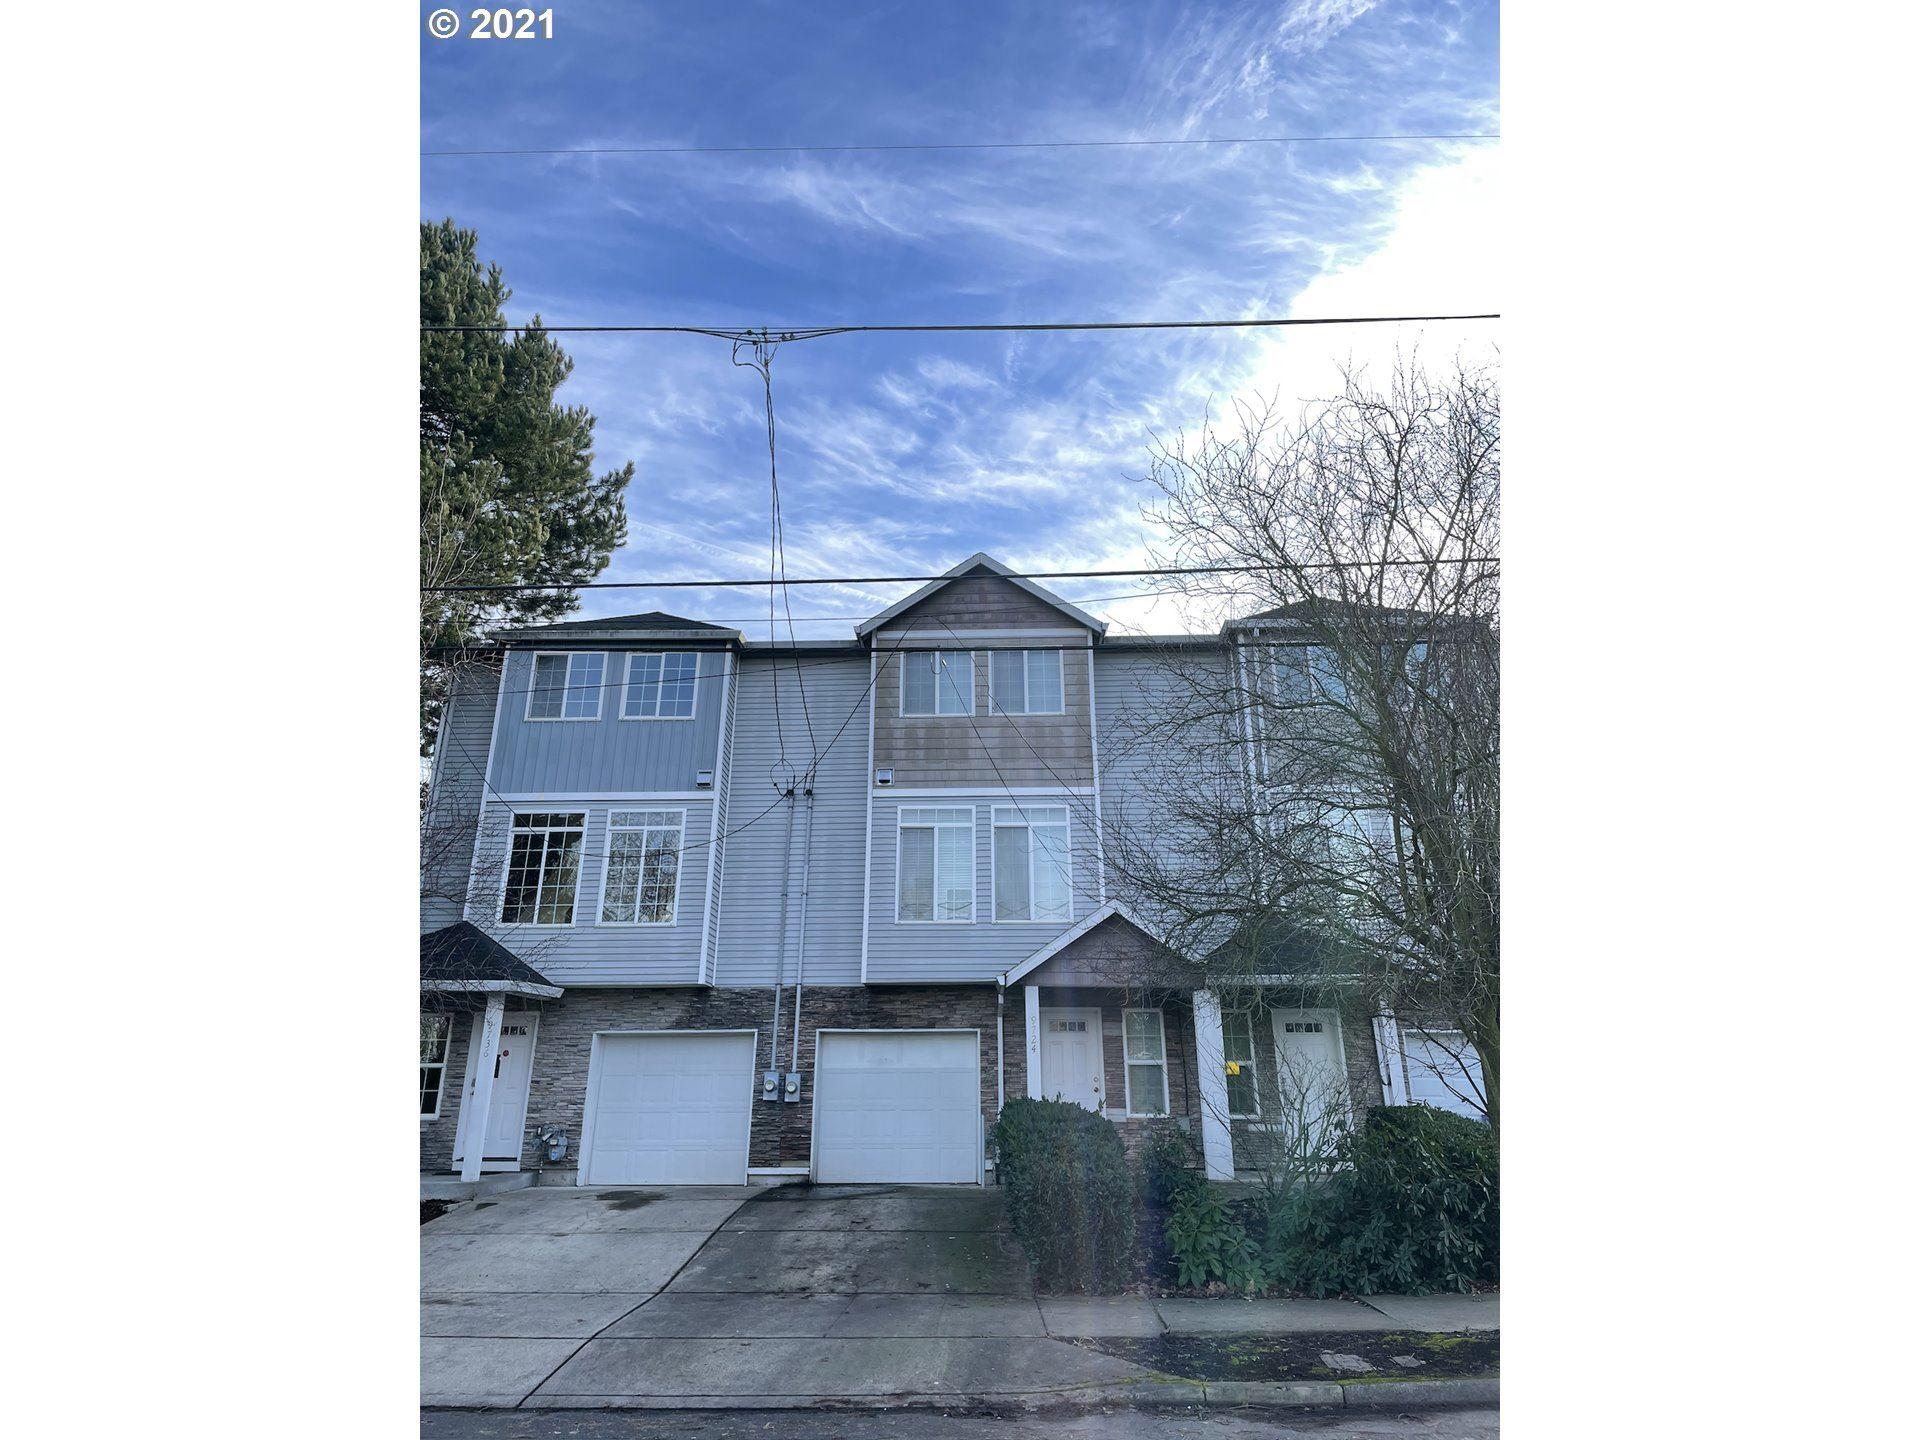 9724 N FAIRHAVEN AVE, Portland, OR 97203 - MLS#: 20334119